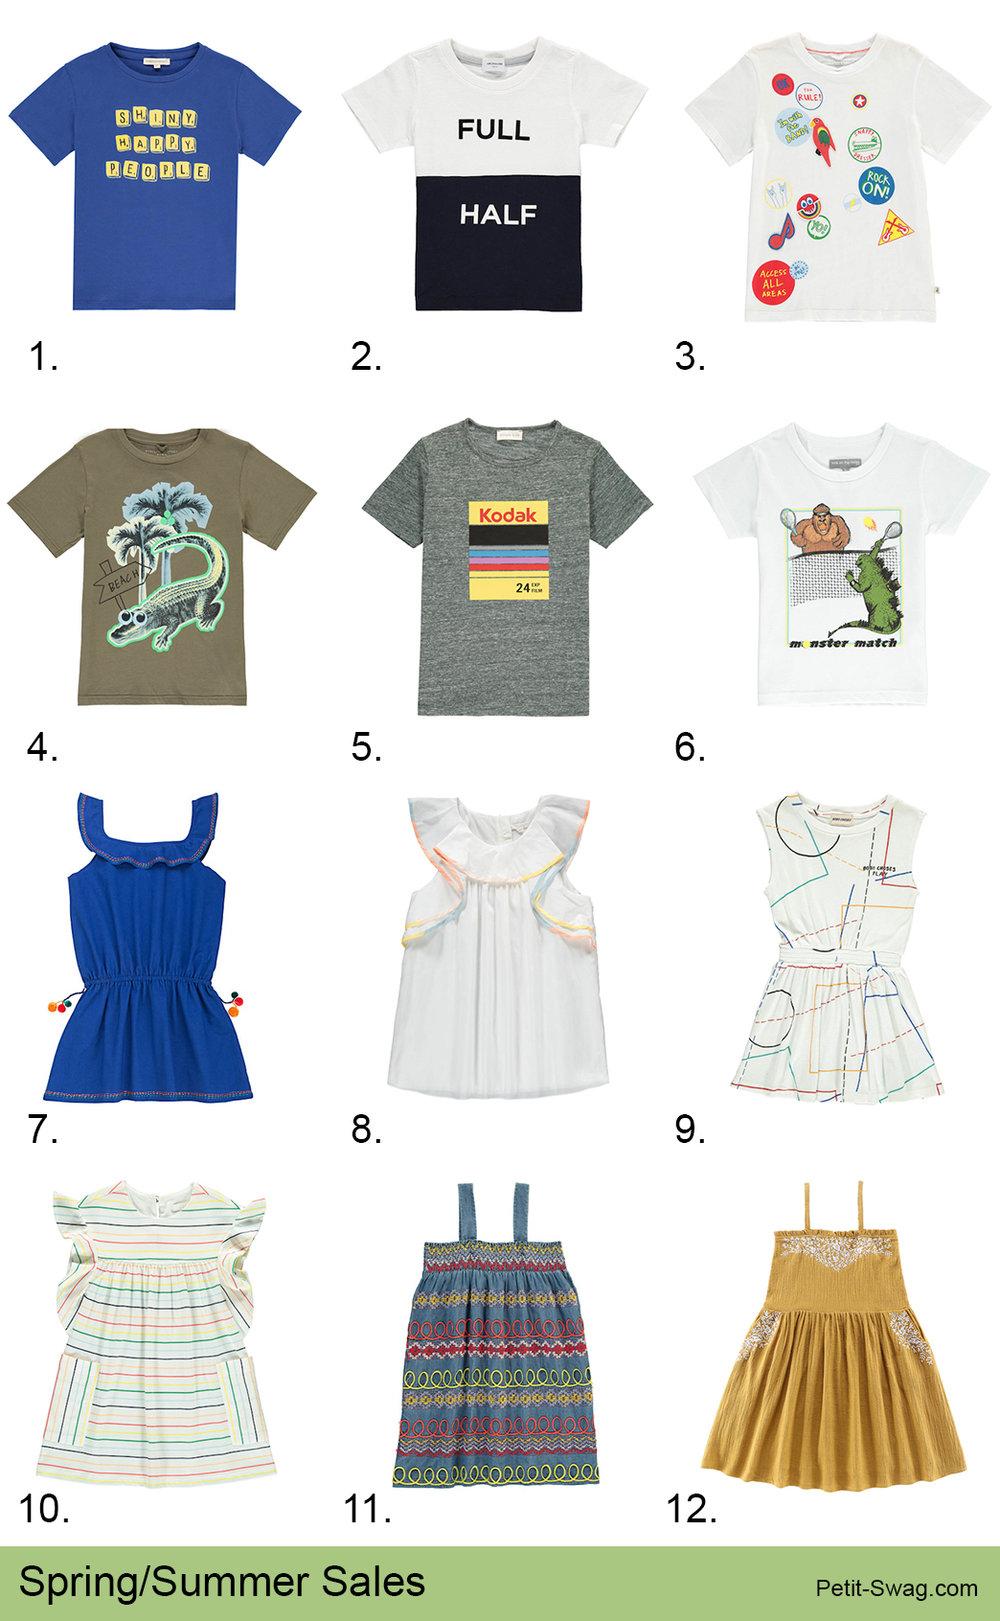 Spring/Summer Sales | Petit-Swag.com